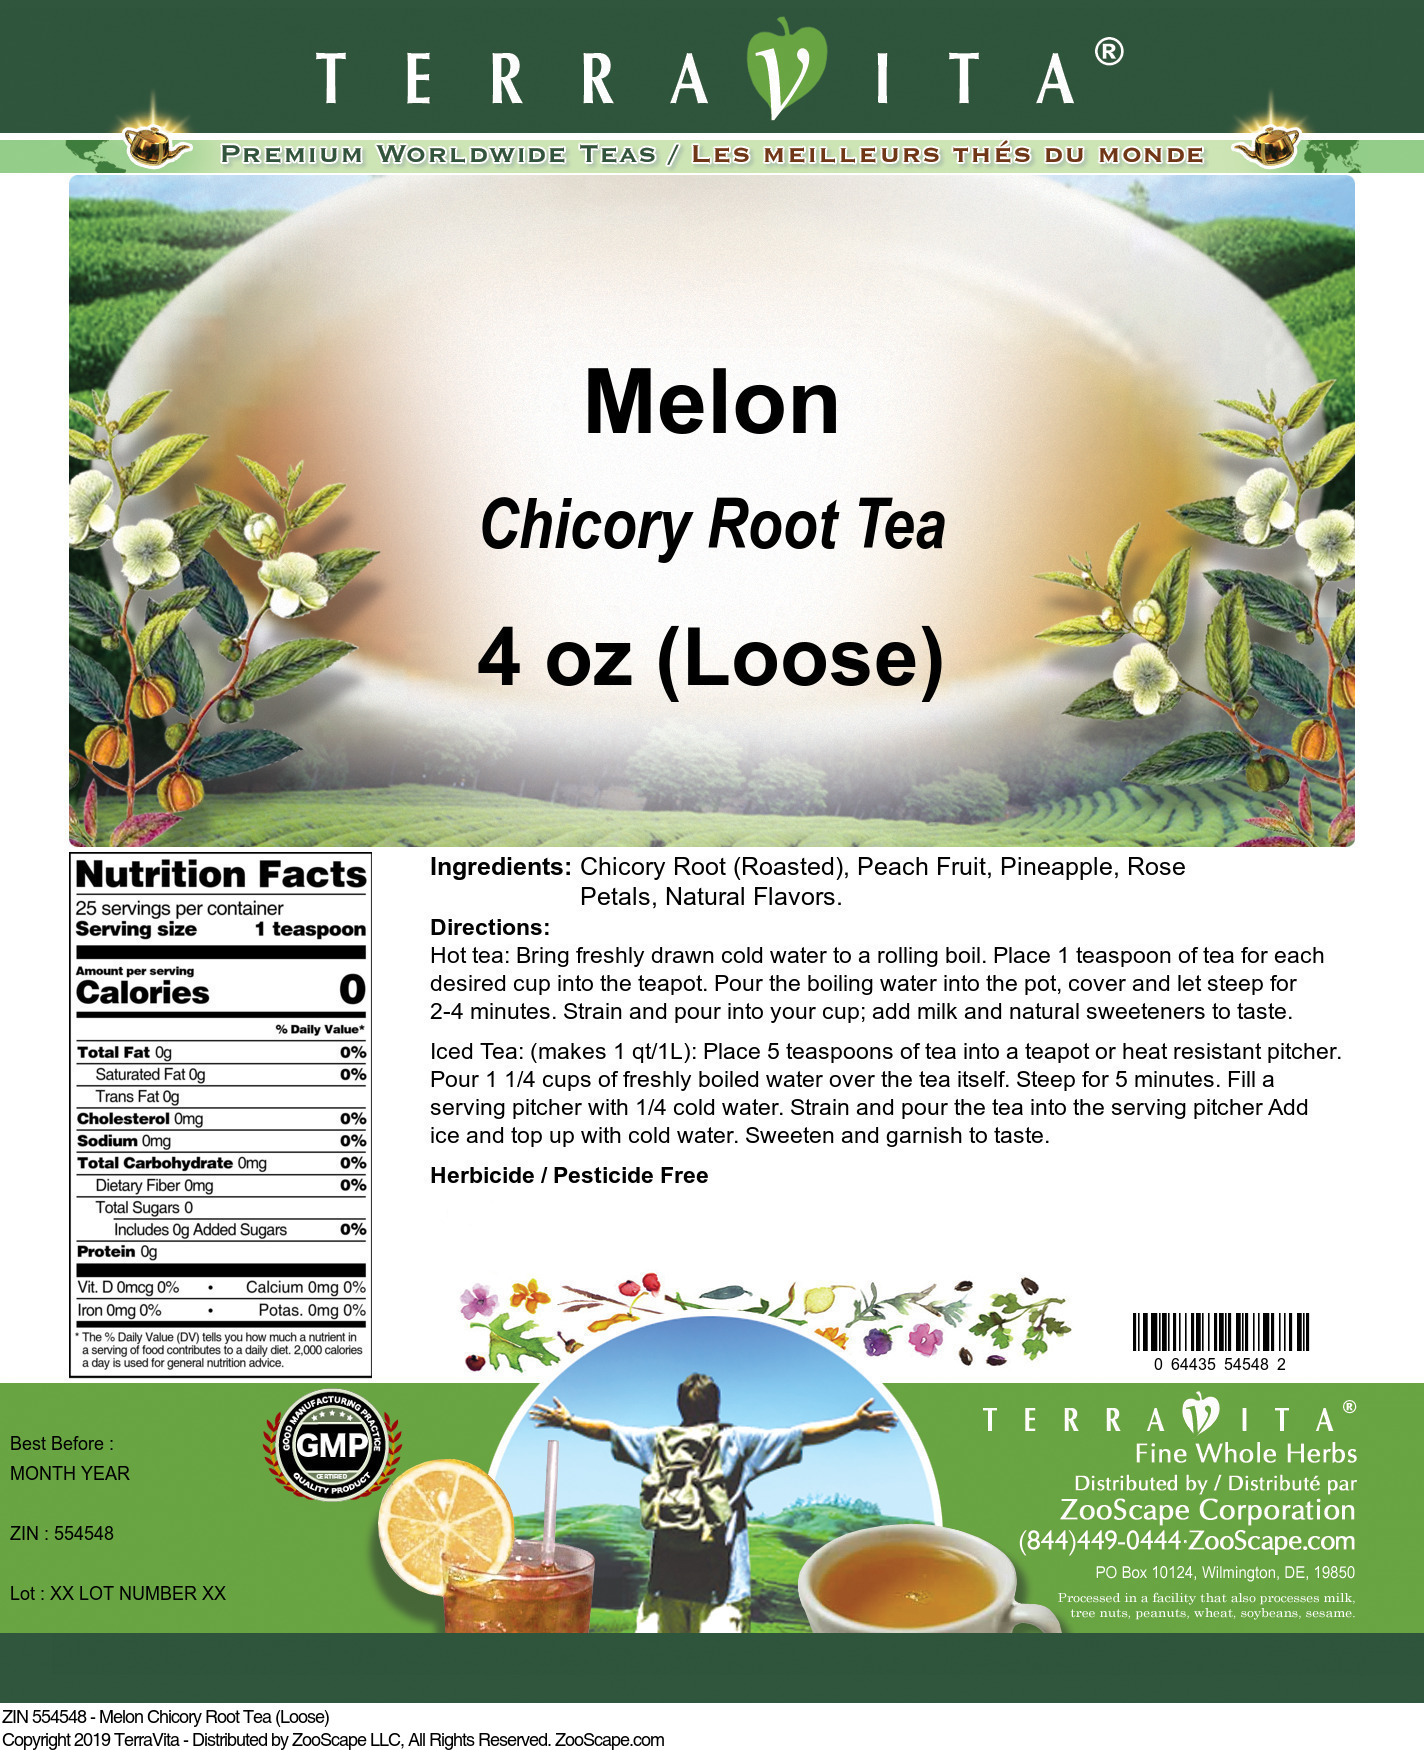 Melon Chicory Root Tea (Loose)